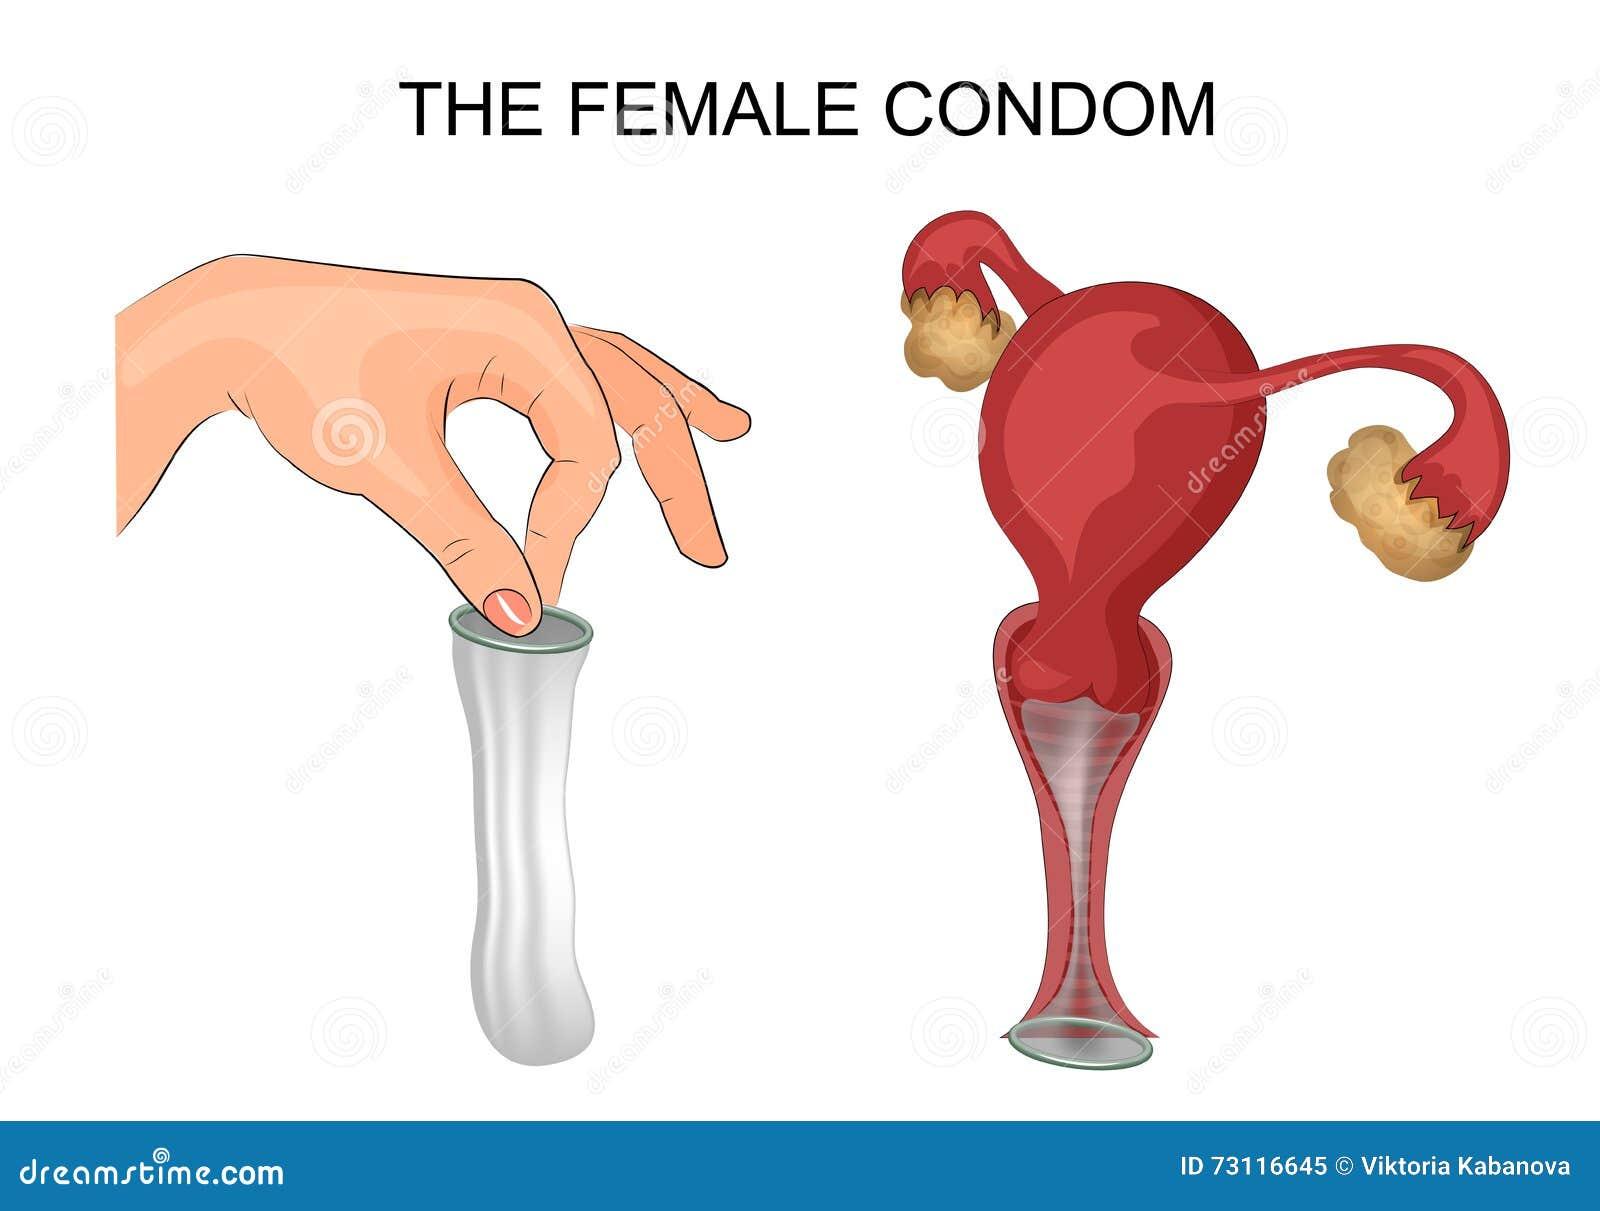 Female Condom - Feminist Womens Health Center in